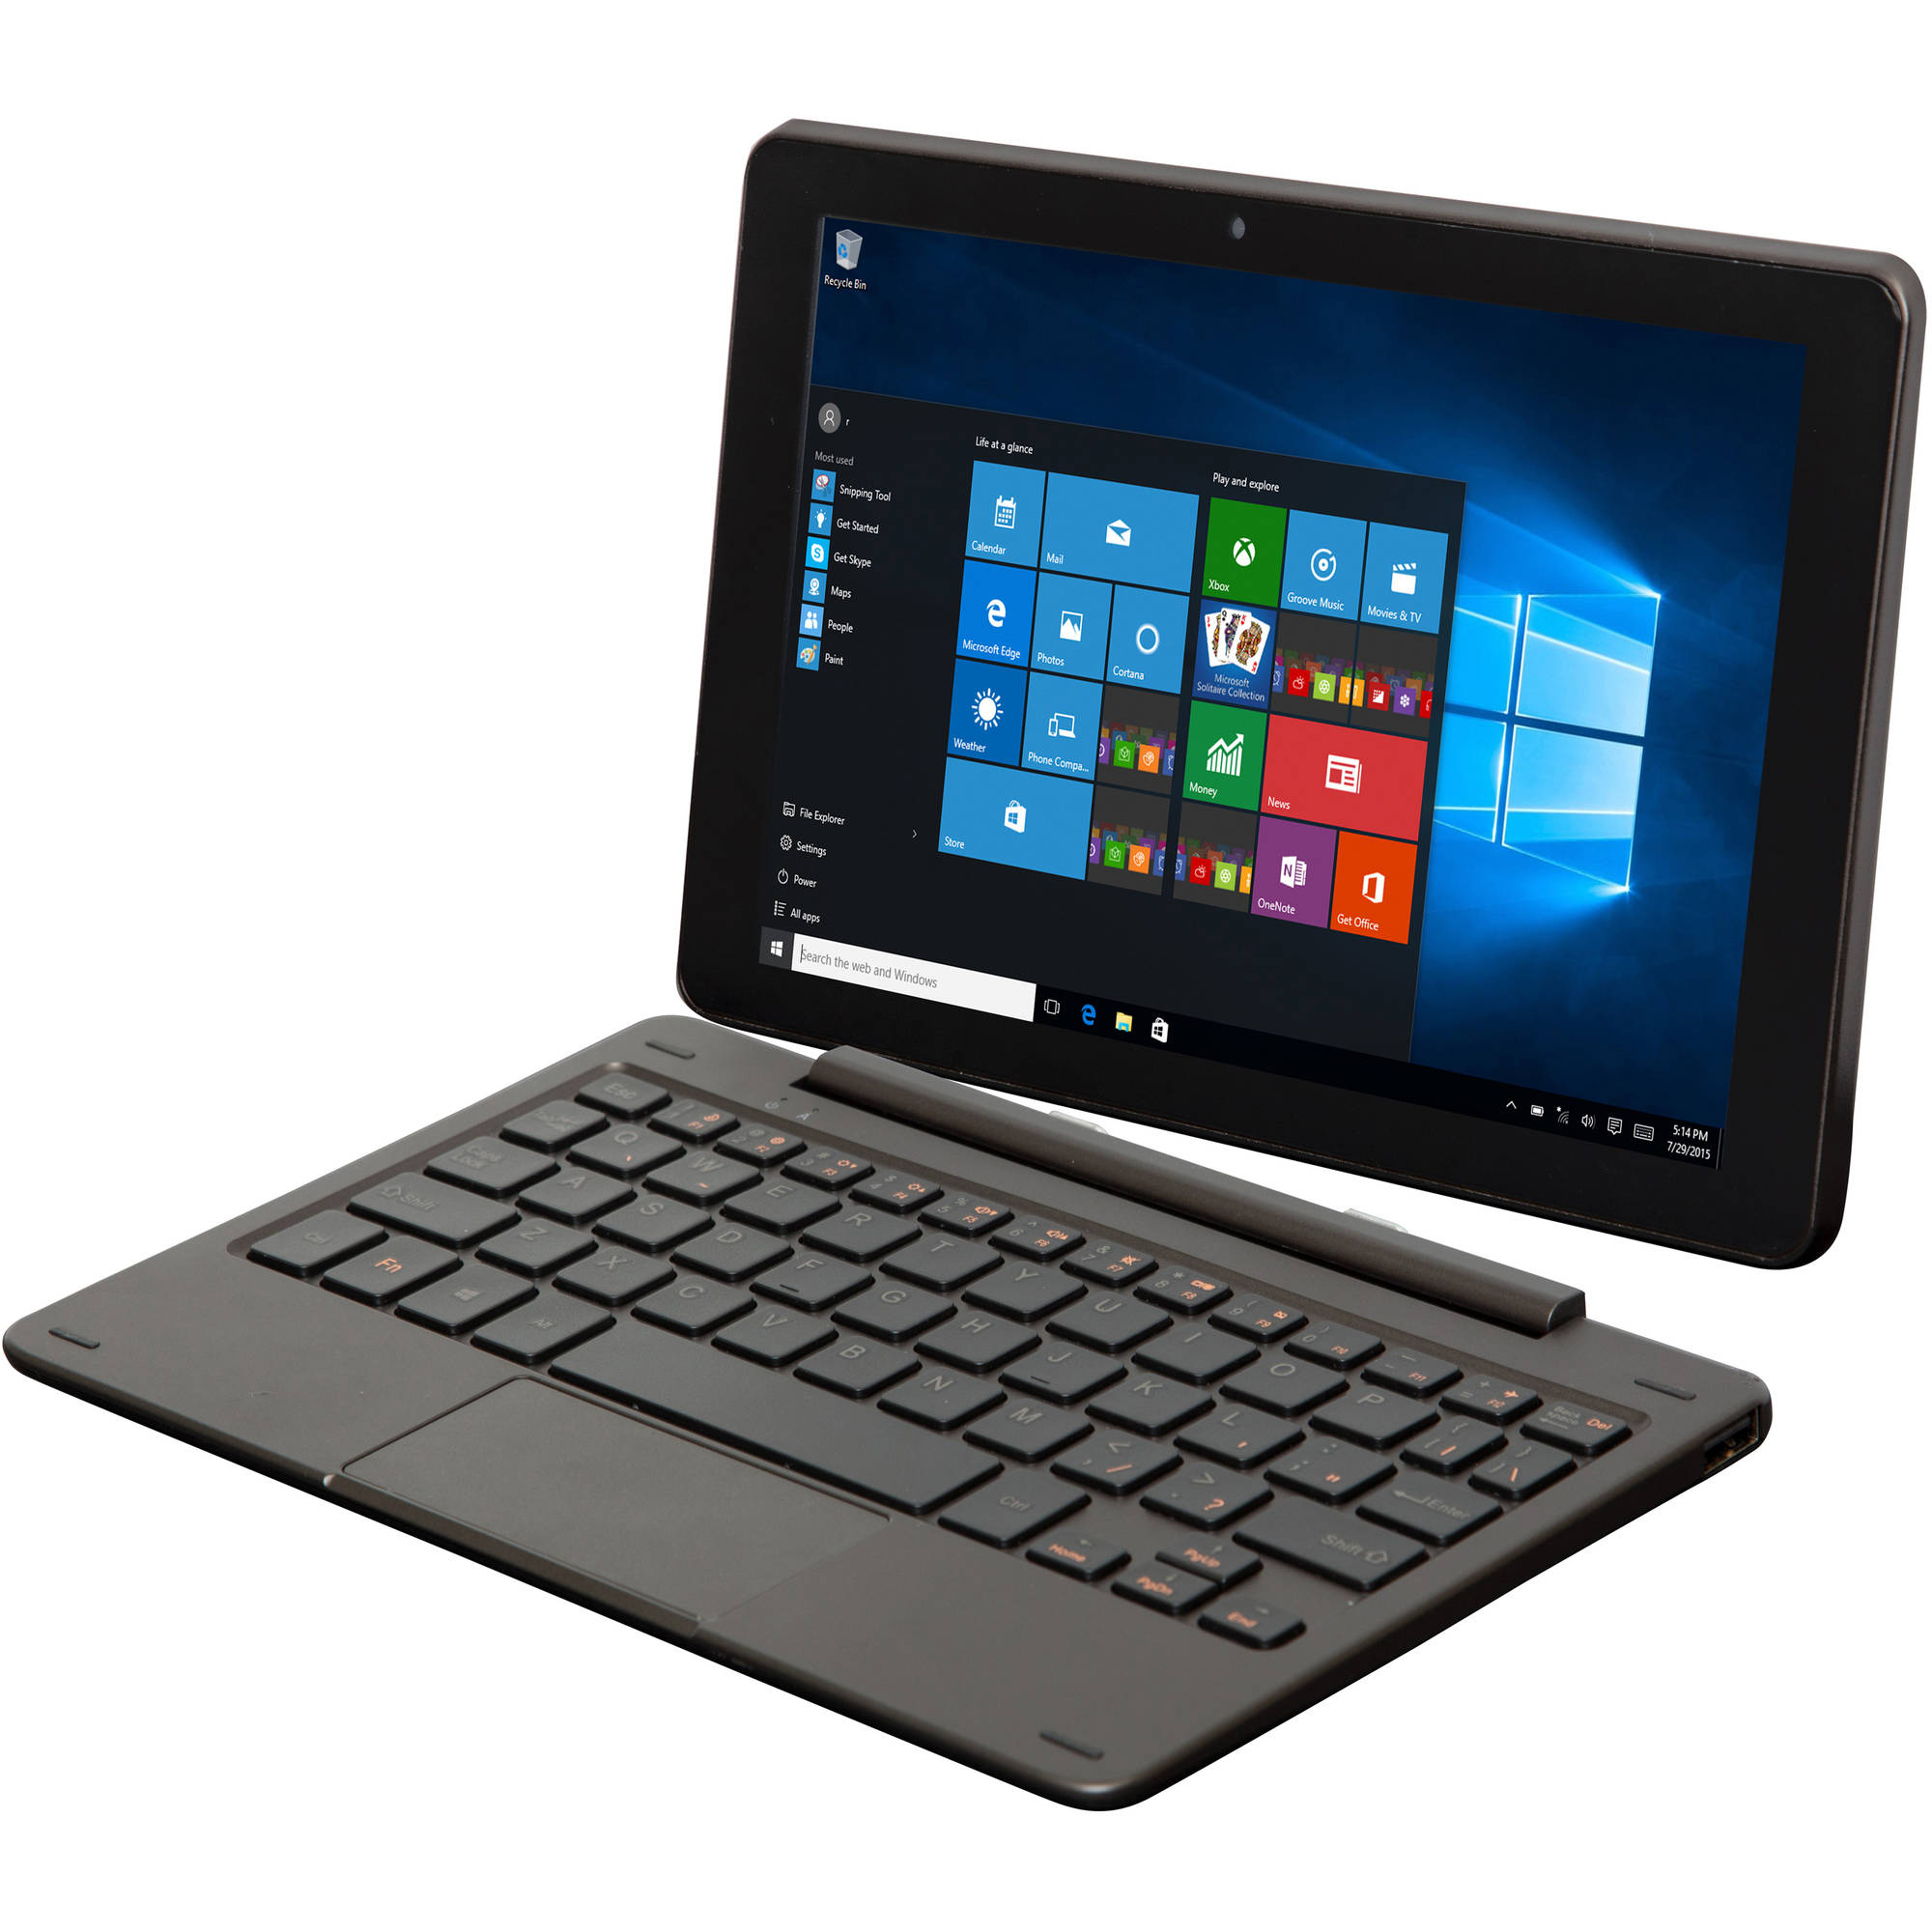 "Nextbook Flexx 8.9"" 2-in-1 Tablet 32GB Intel Atom Z3735G Quad-Core Processor Windows 10"